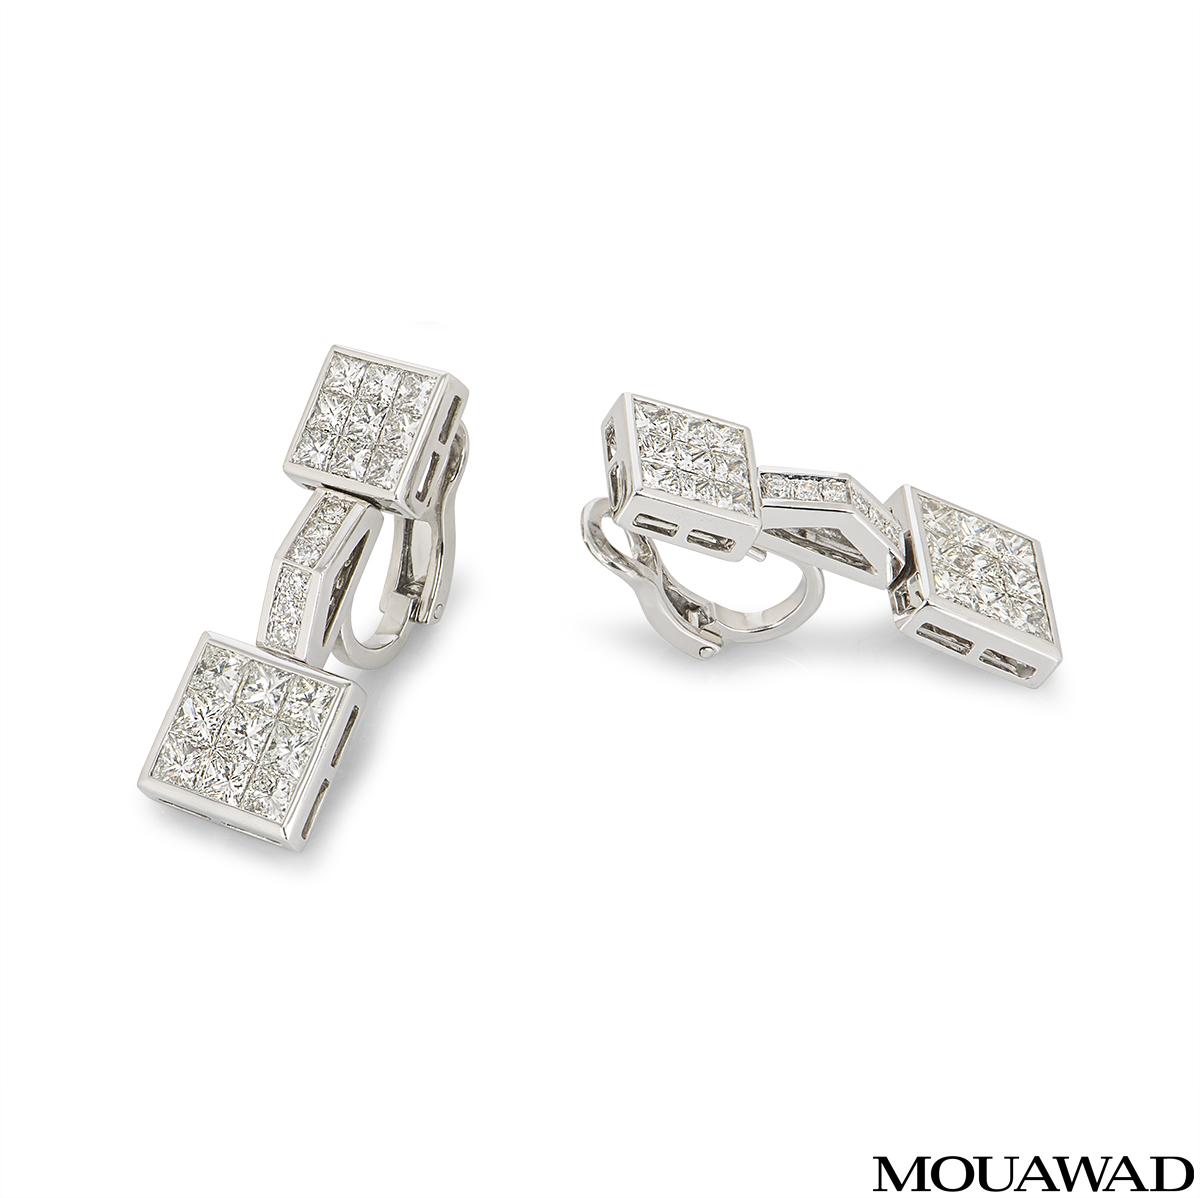 Mouawad Diamond Earrings